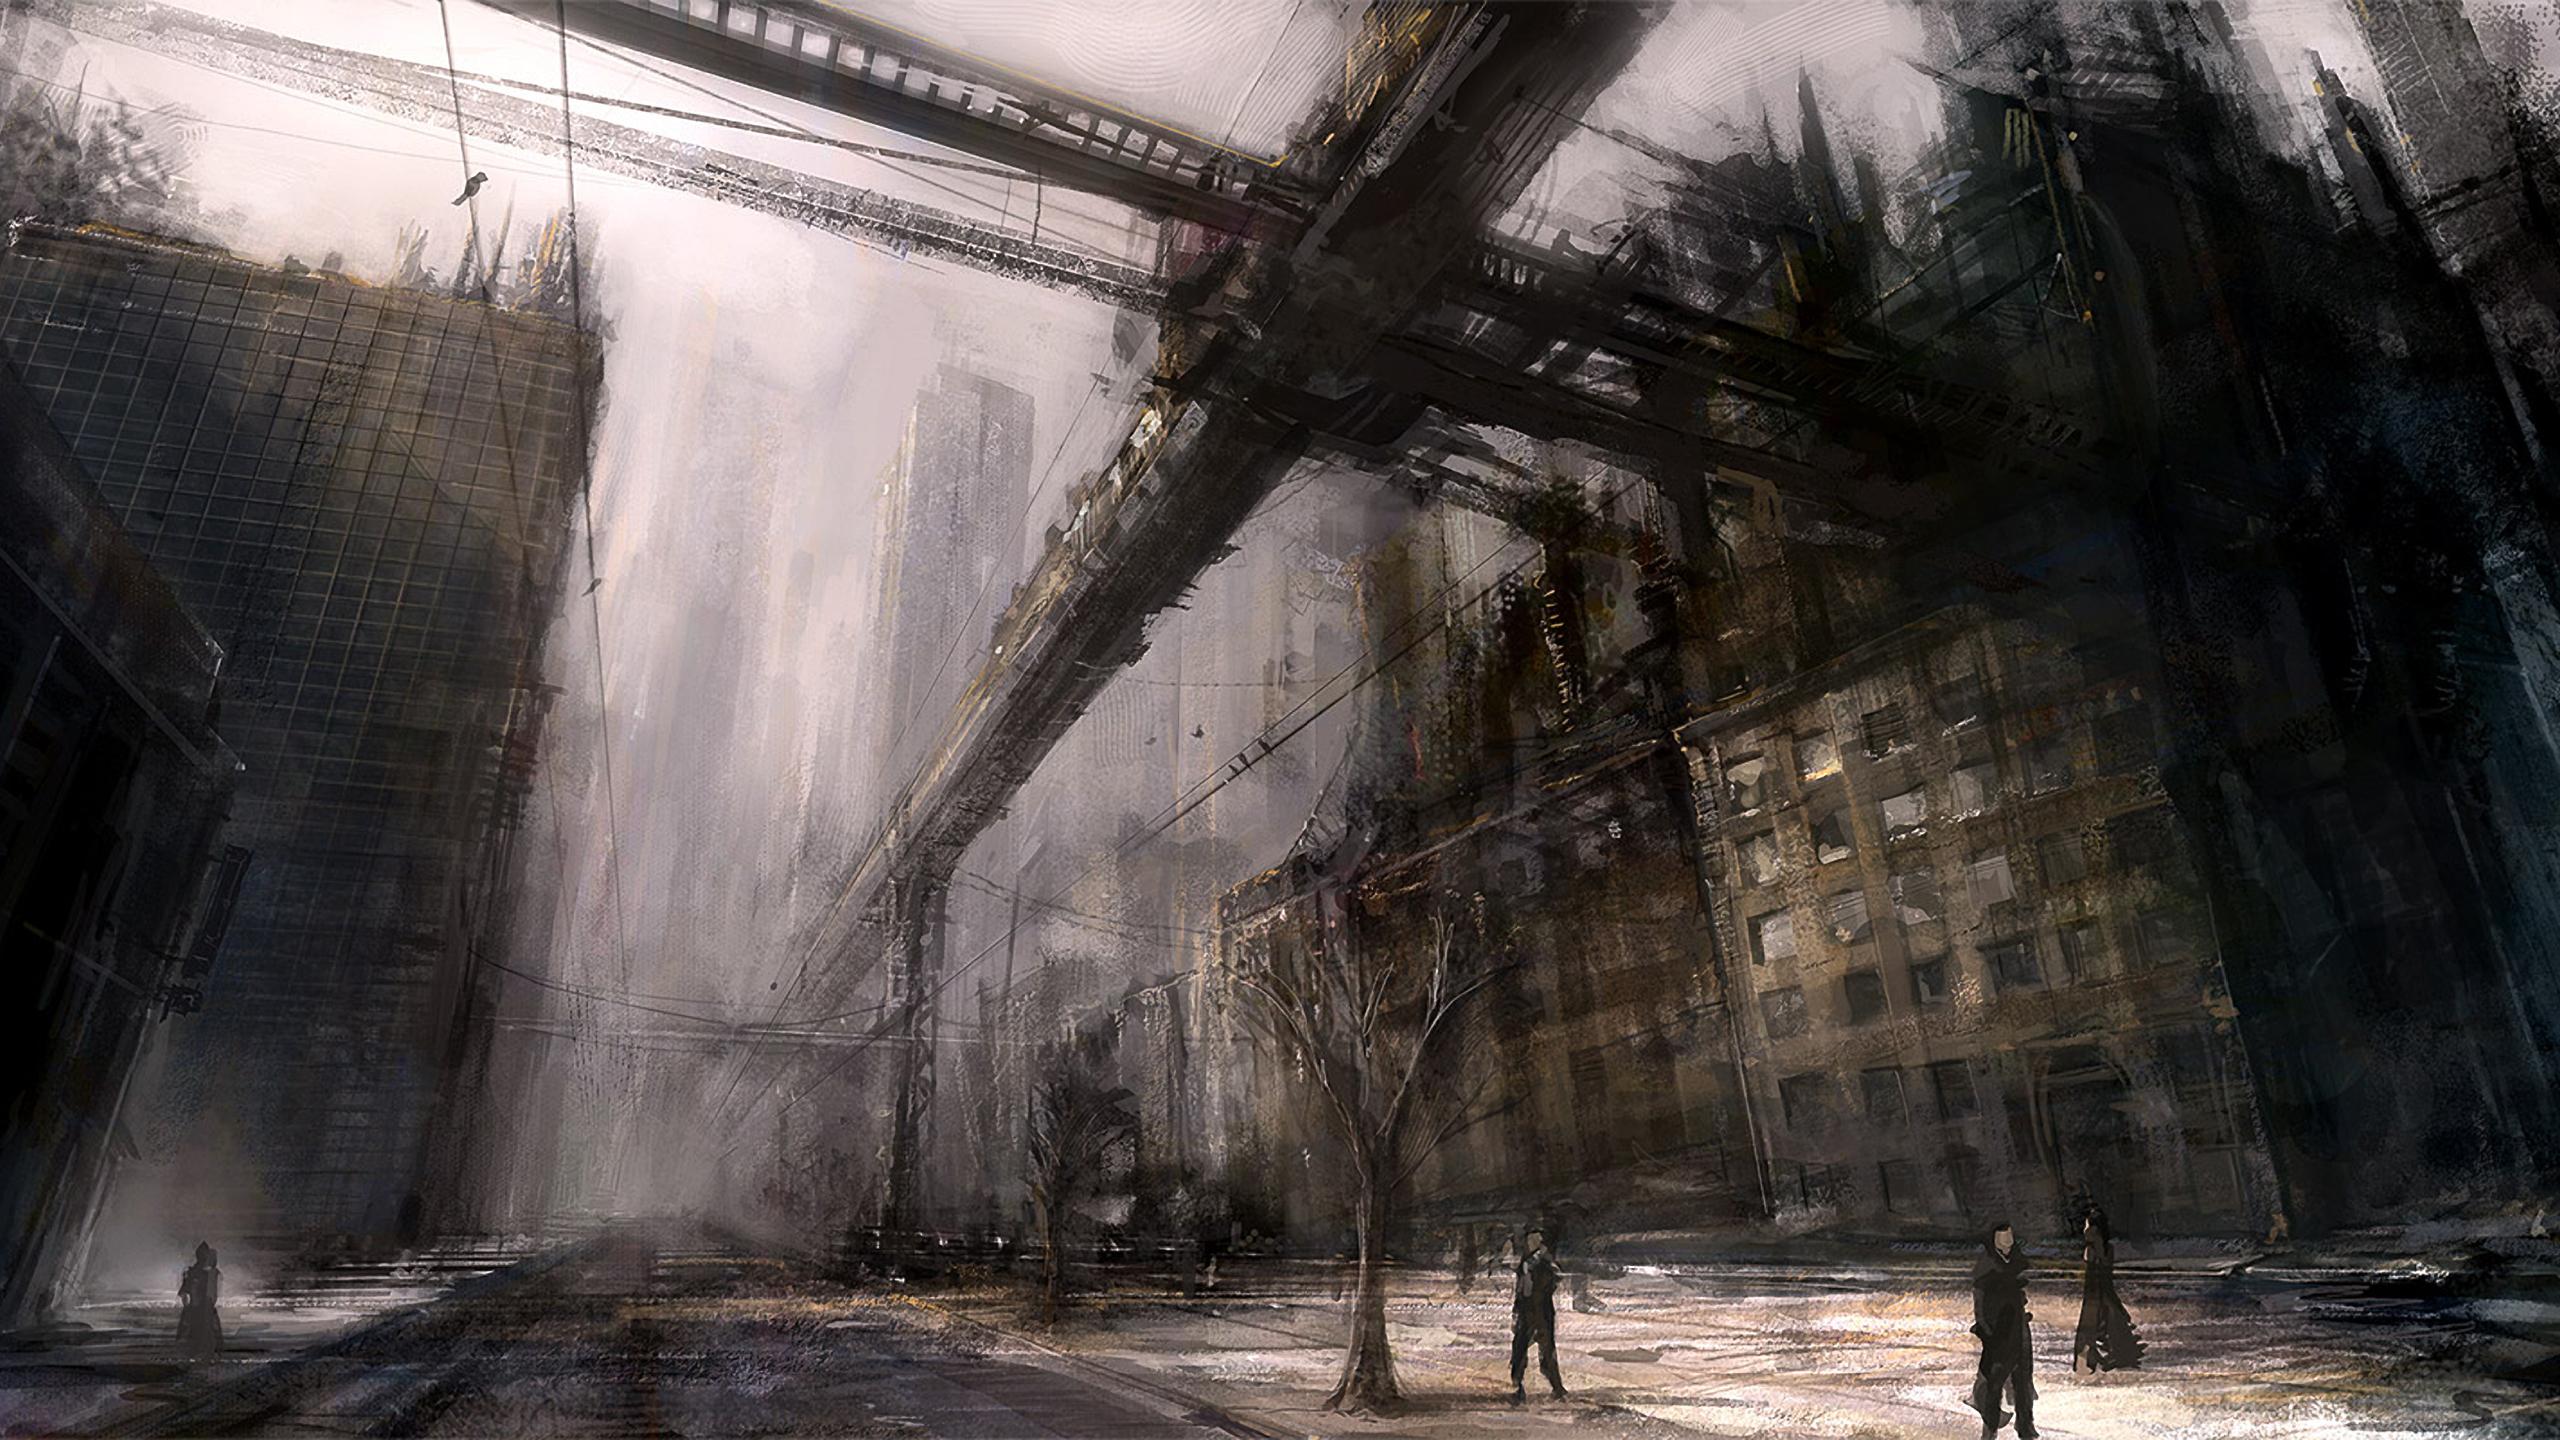 Best 60 Dystopia Wallpaper on HipWallpaper Dystopia Wallpaper 2560x1440